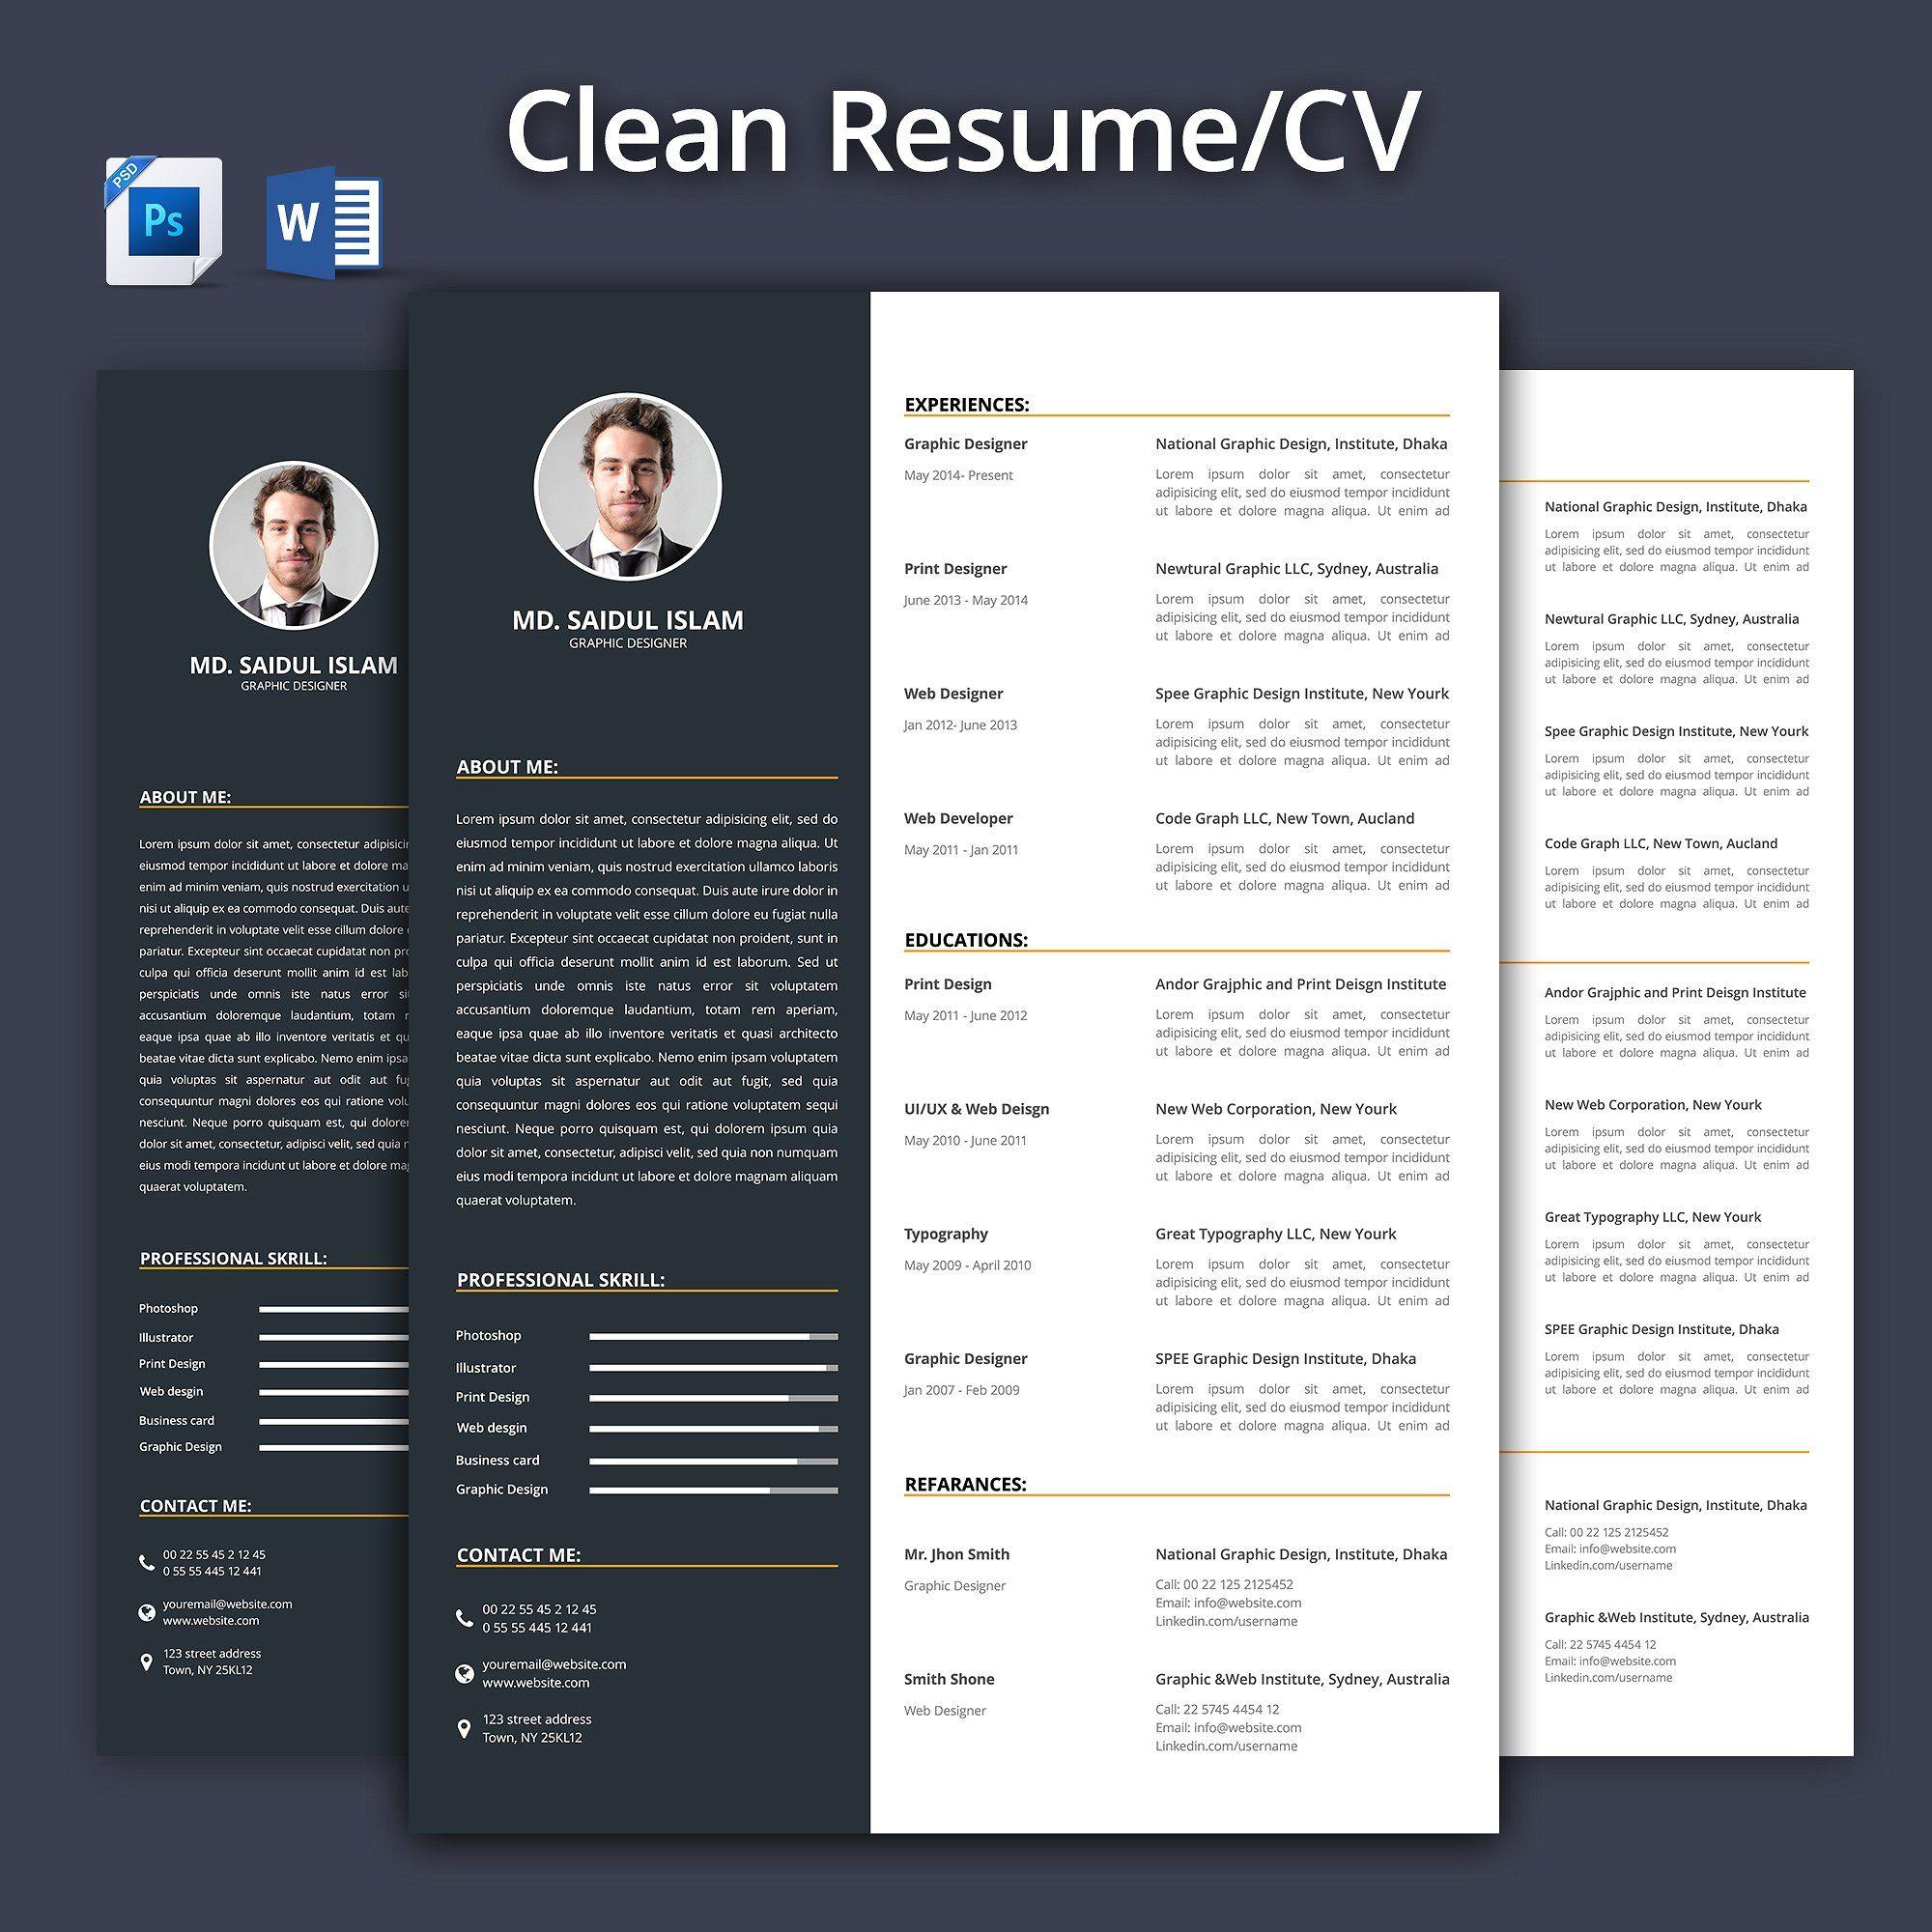 Clean Resume - CV 2017 | Resume cv and Cv template